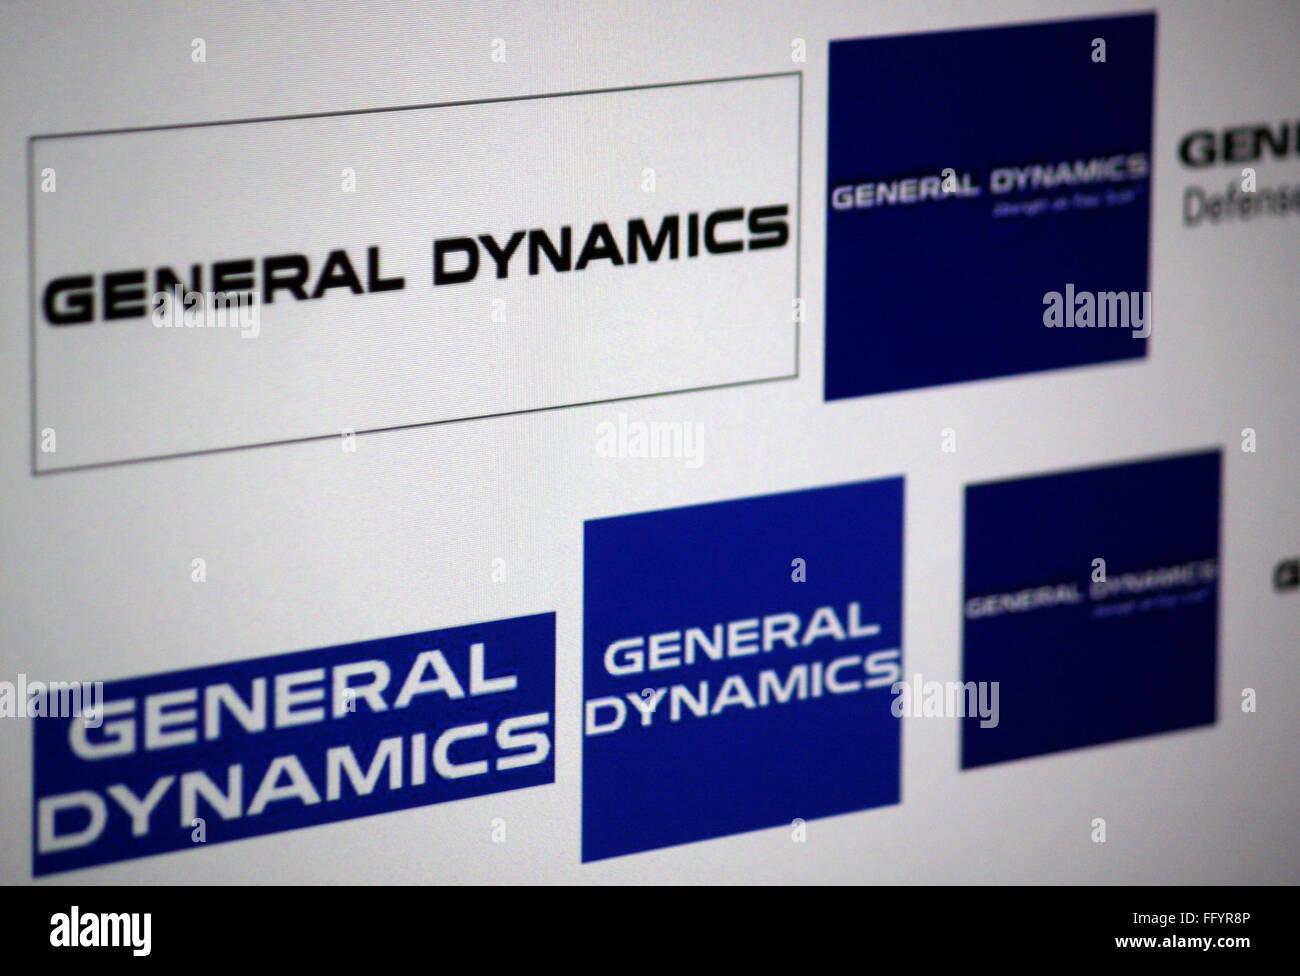 "Markenname: 'General Dynamics"". Immagini Stock"